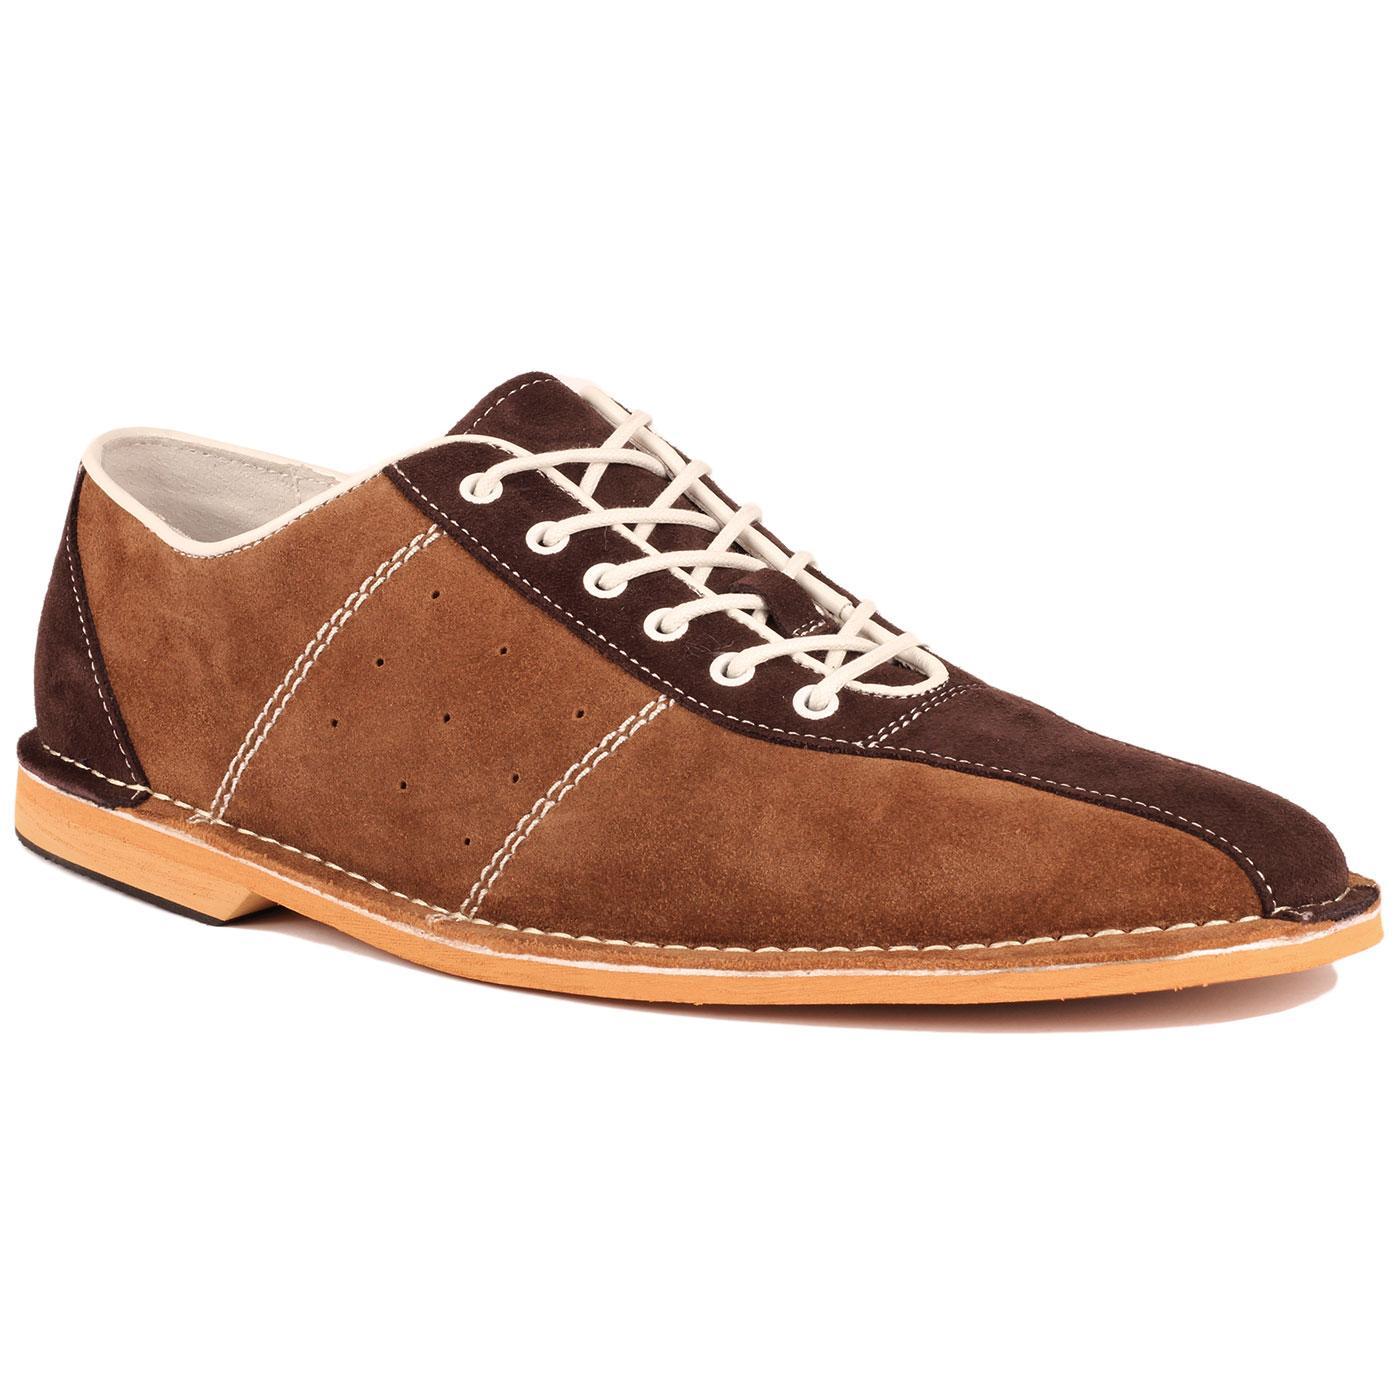 The Dude MADCAP ENGLAND Mod Bowling Shoes (Tan)